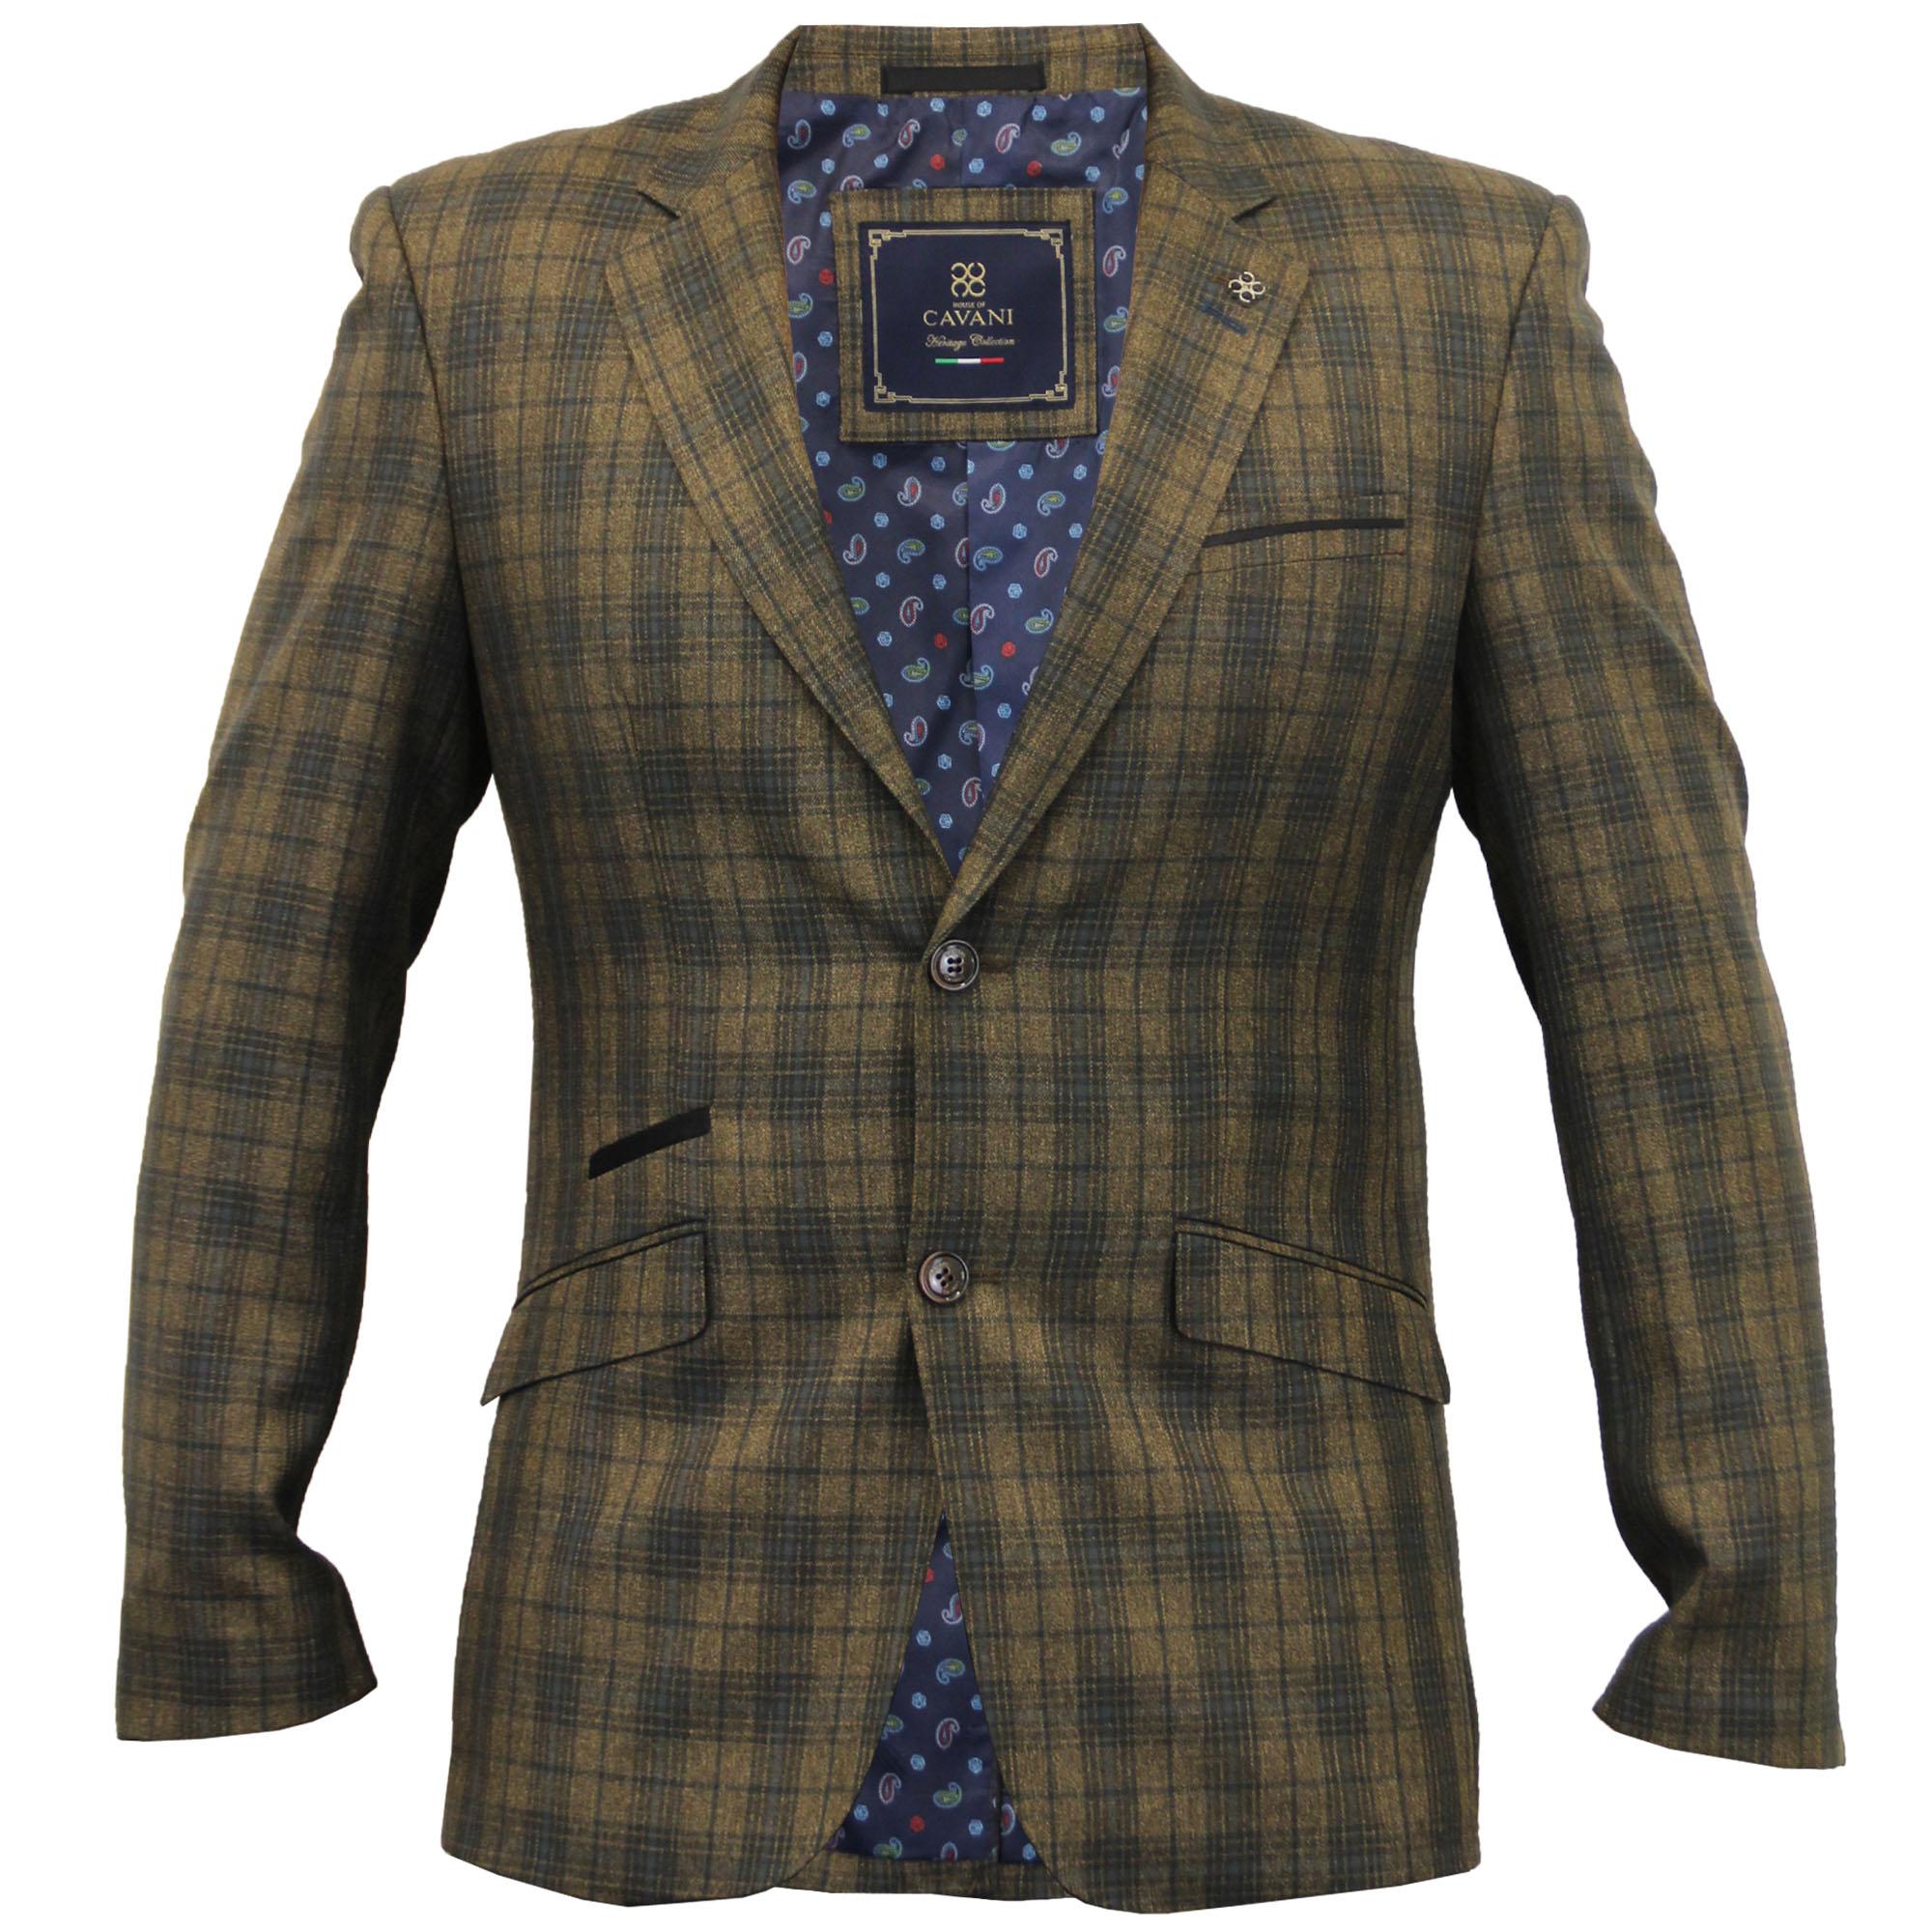 Mens Blazer Cavani Coat Dinner Suit Slim Fit Jacket Tartan Checked ...